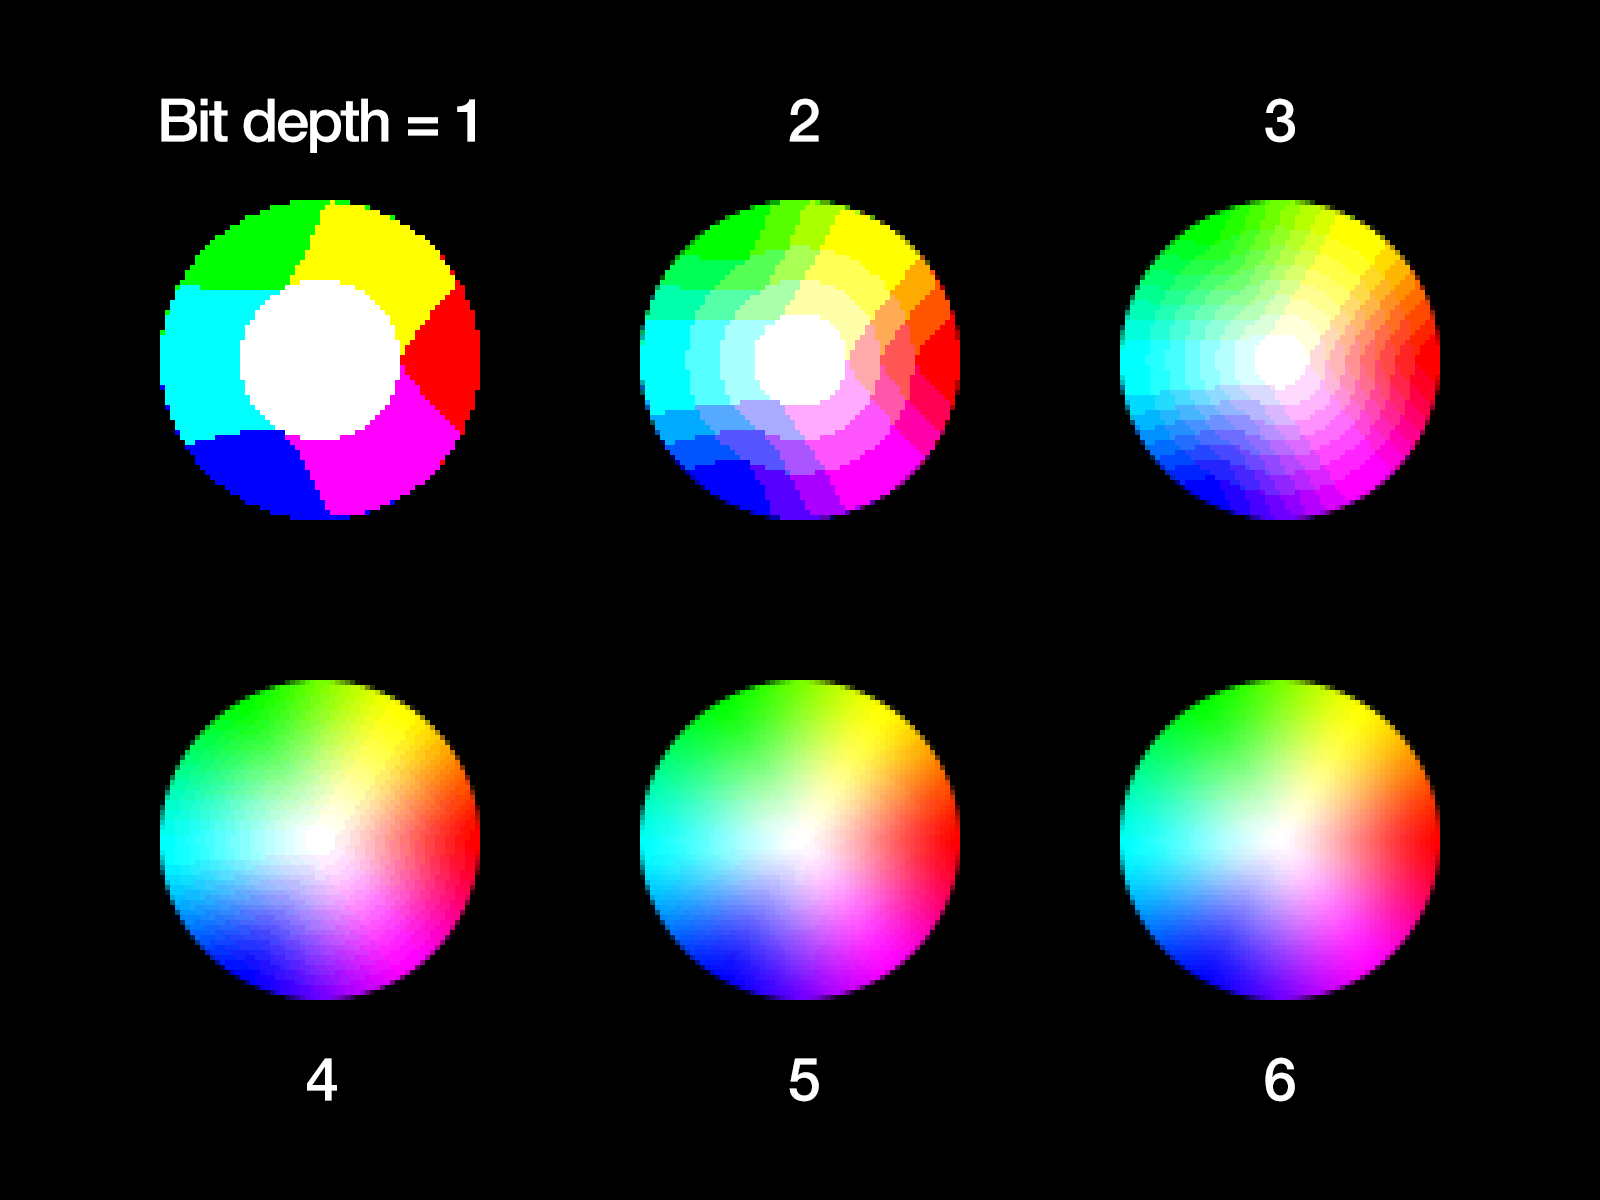 led_matrices_bit-depths.png